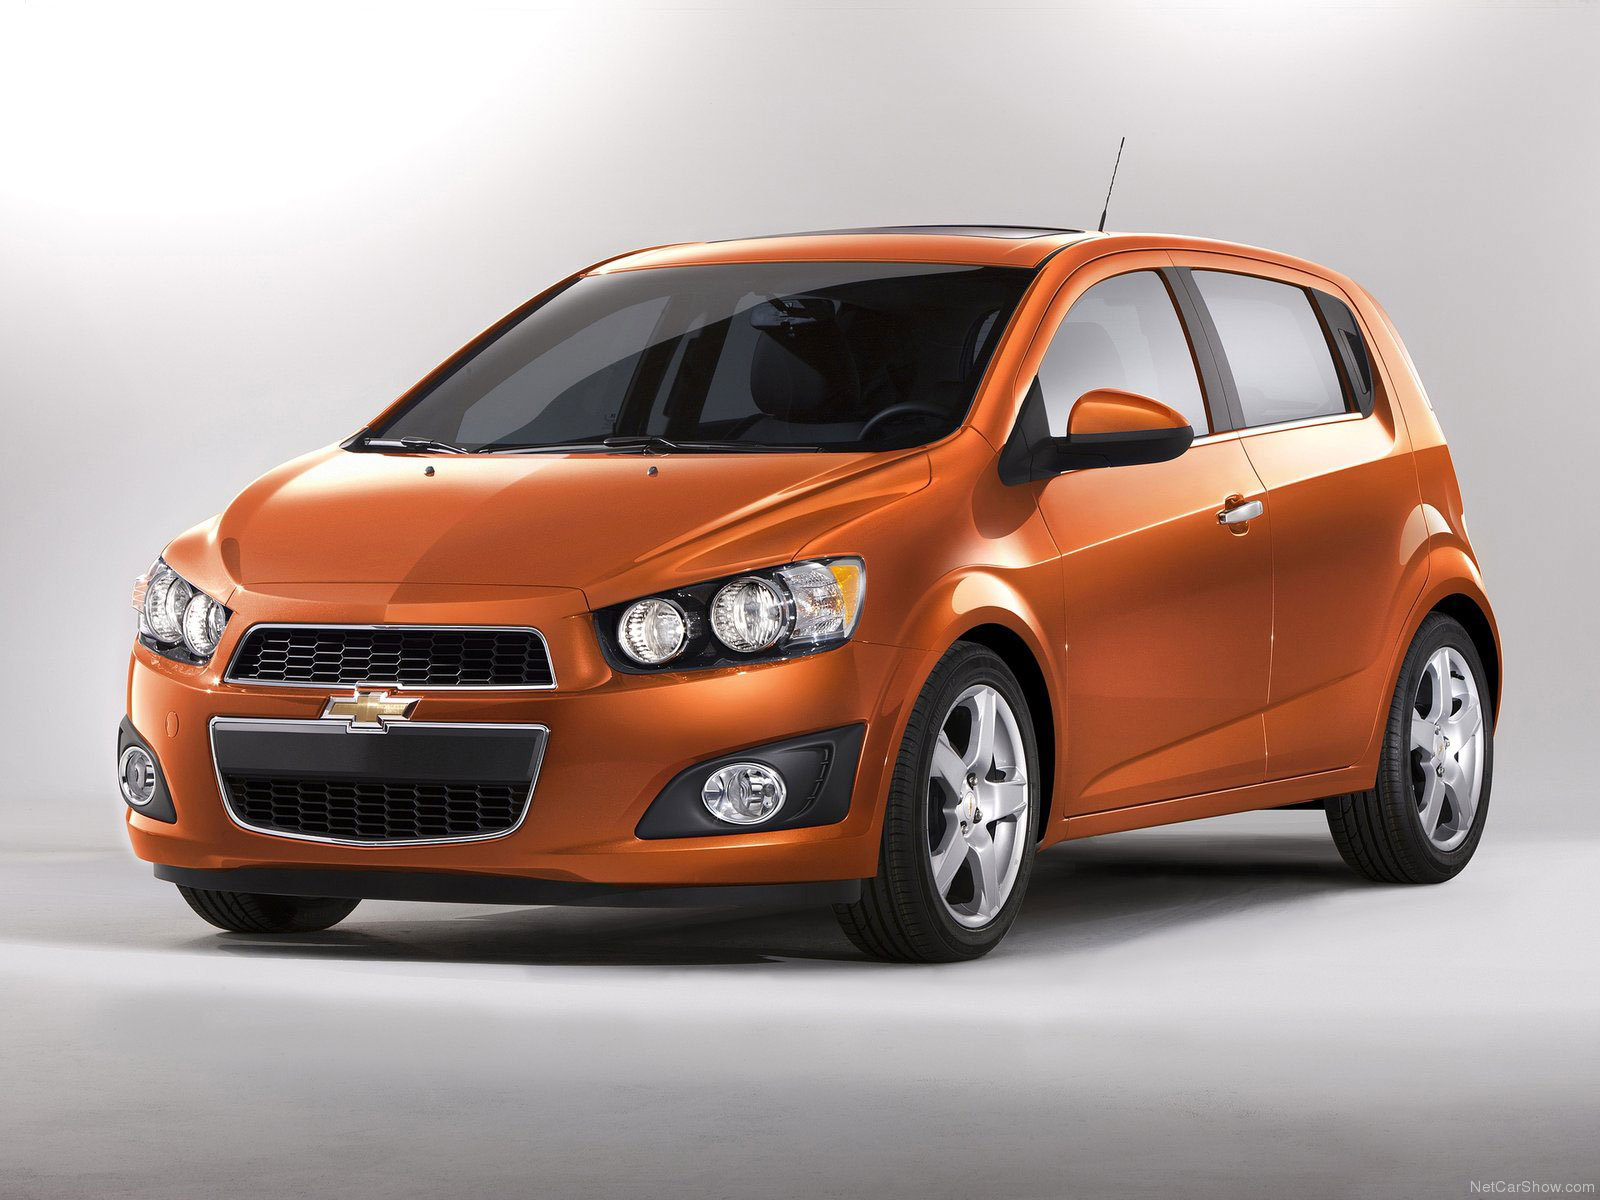 ChevroBlog: Chevrolet Sonic prepara su llegada a Latinoamérica